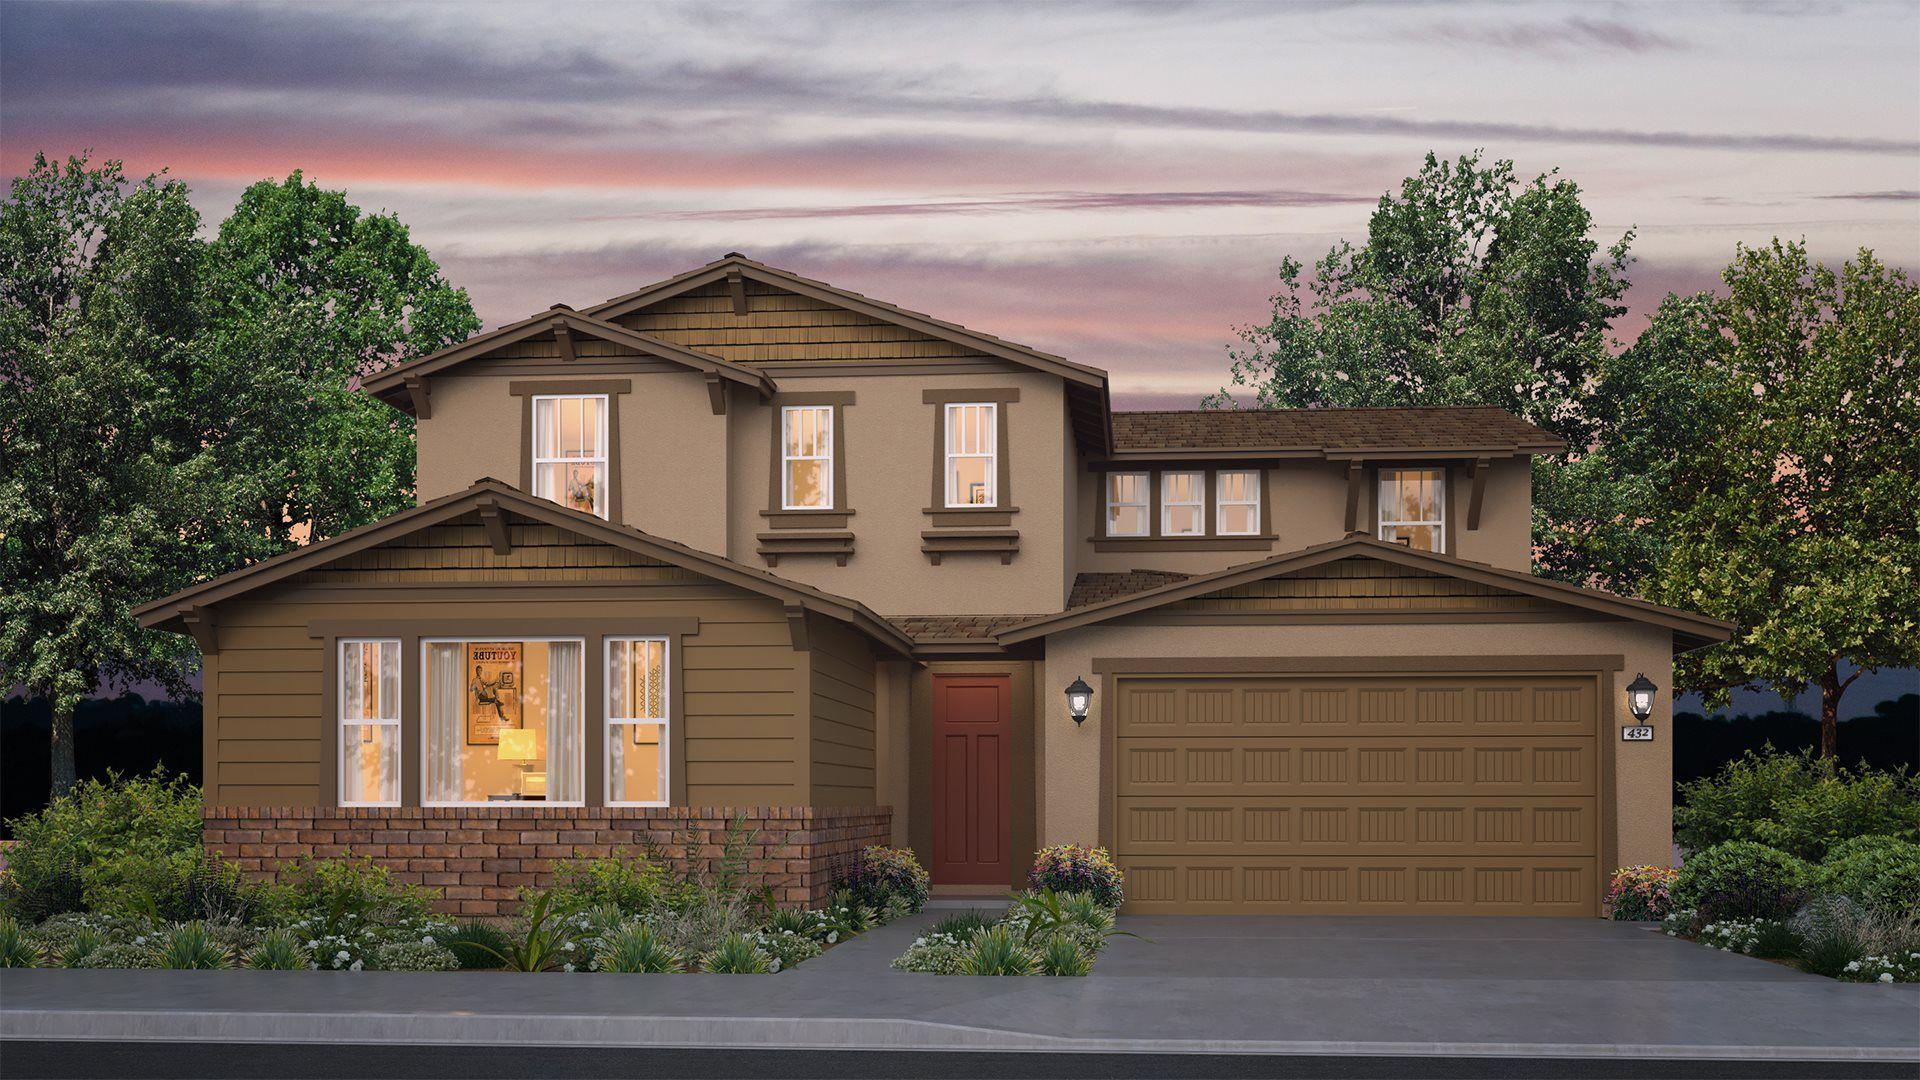 Residence 3135 | Elevation B